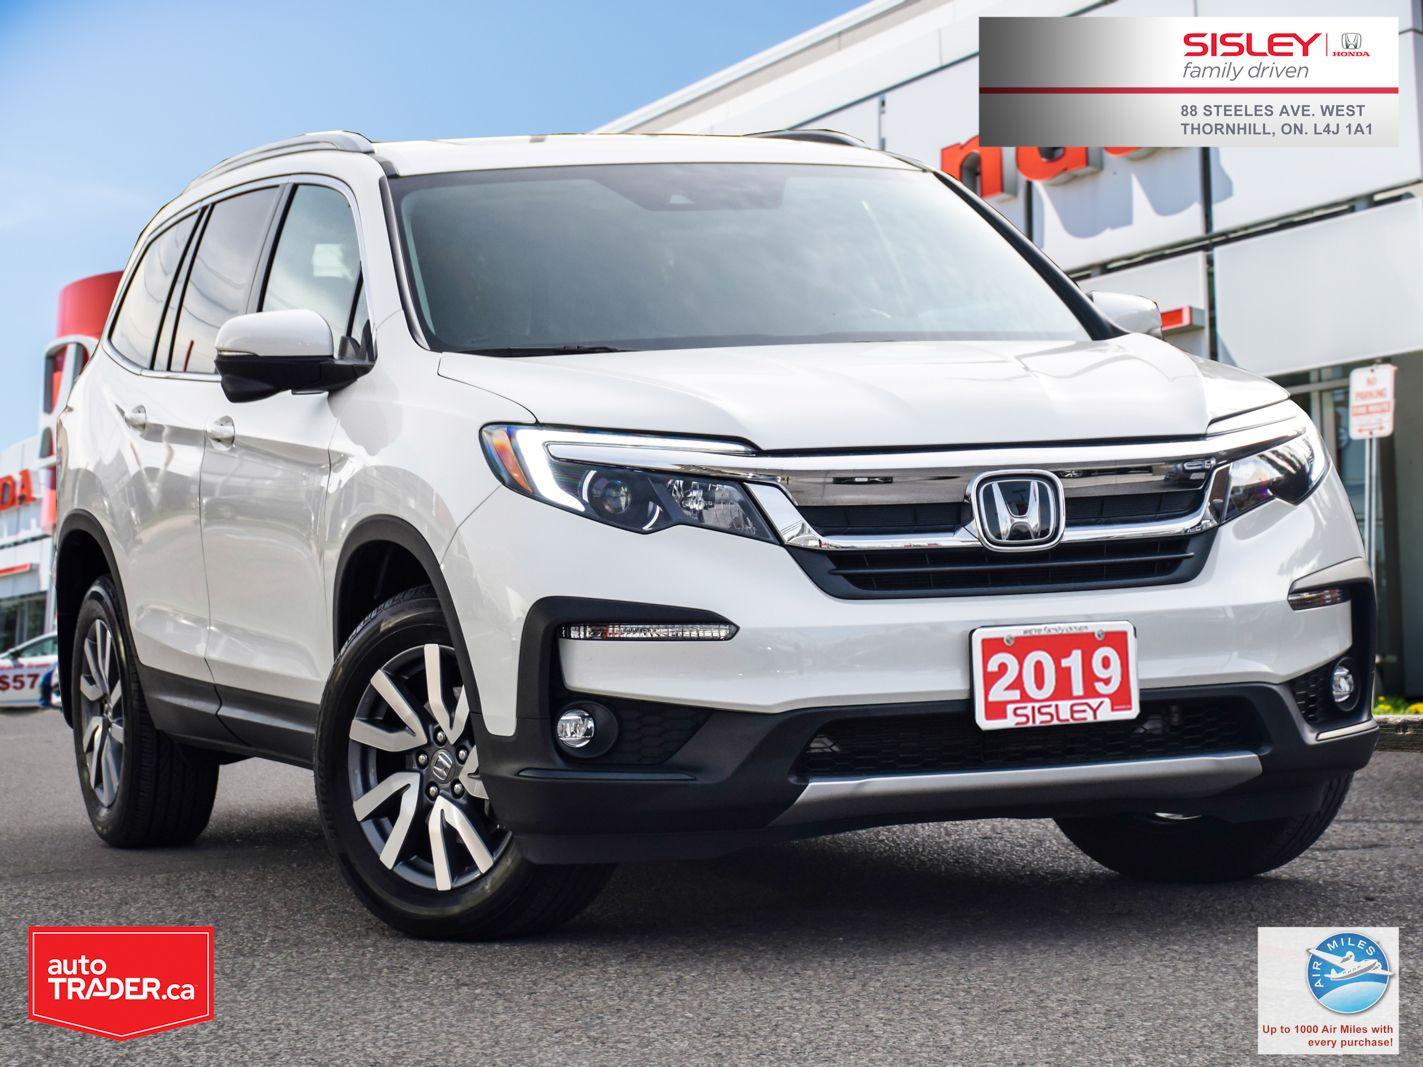 2019 Honda Pilot Image